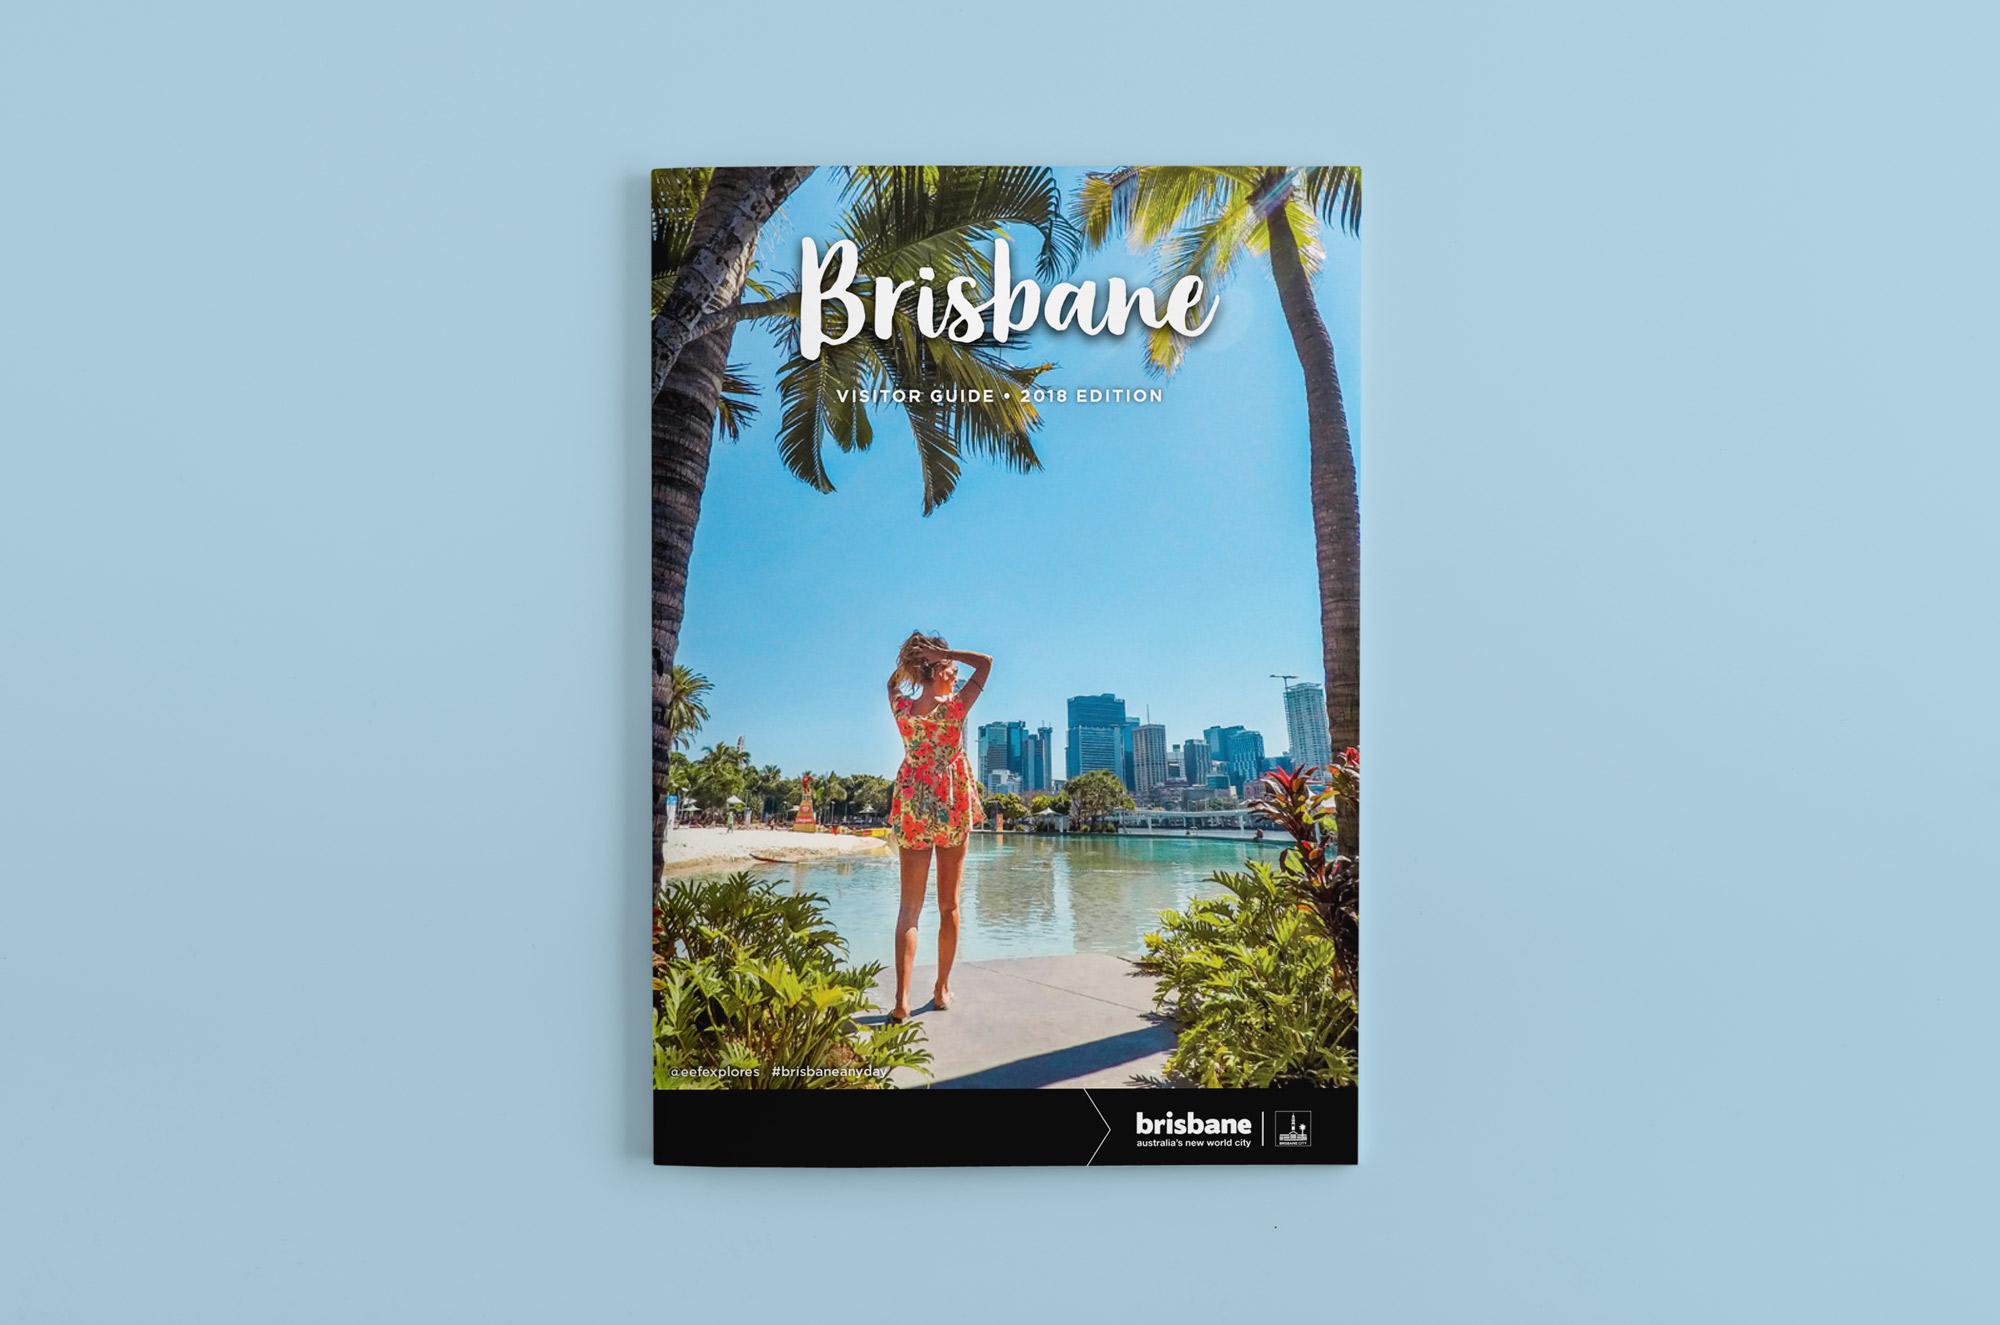 Brisbane Marketing-Visitors-Guide cover.jpg